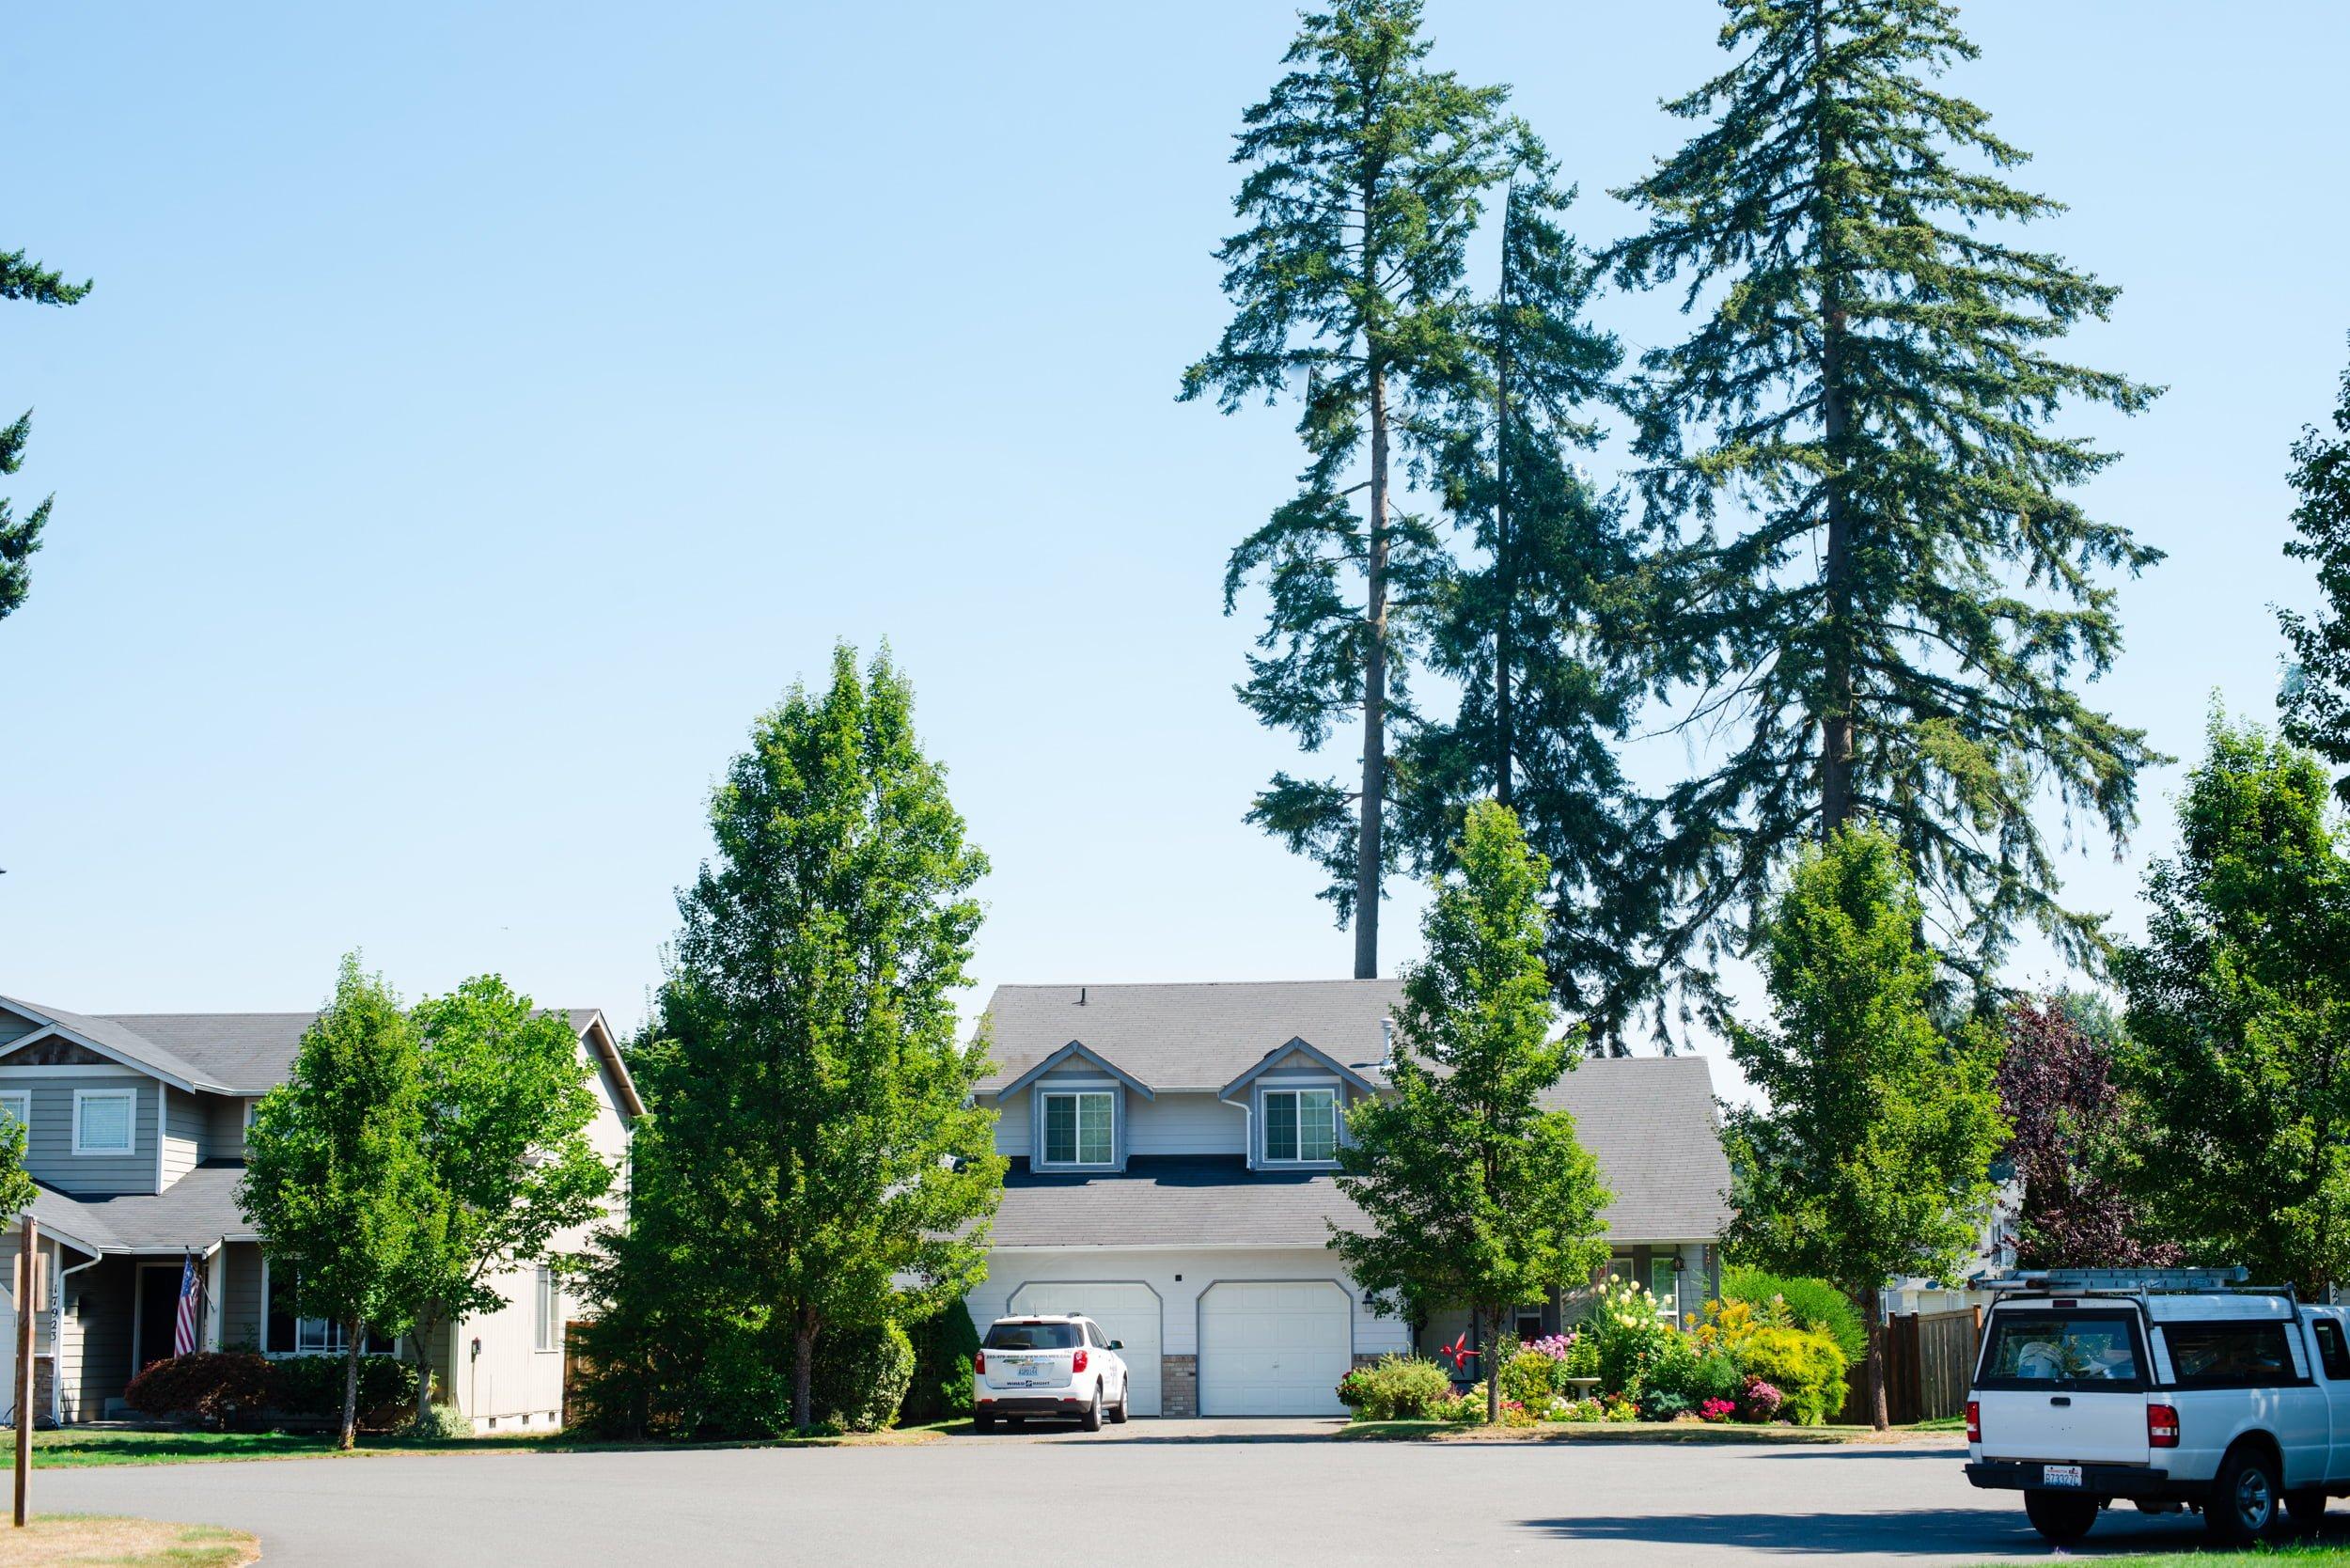 south hill neighborhood homes